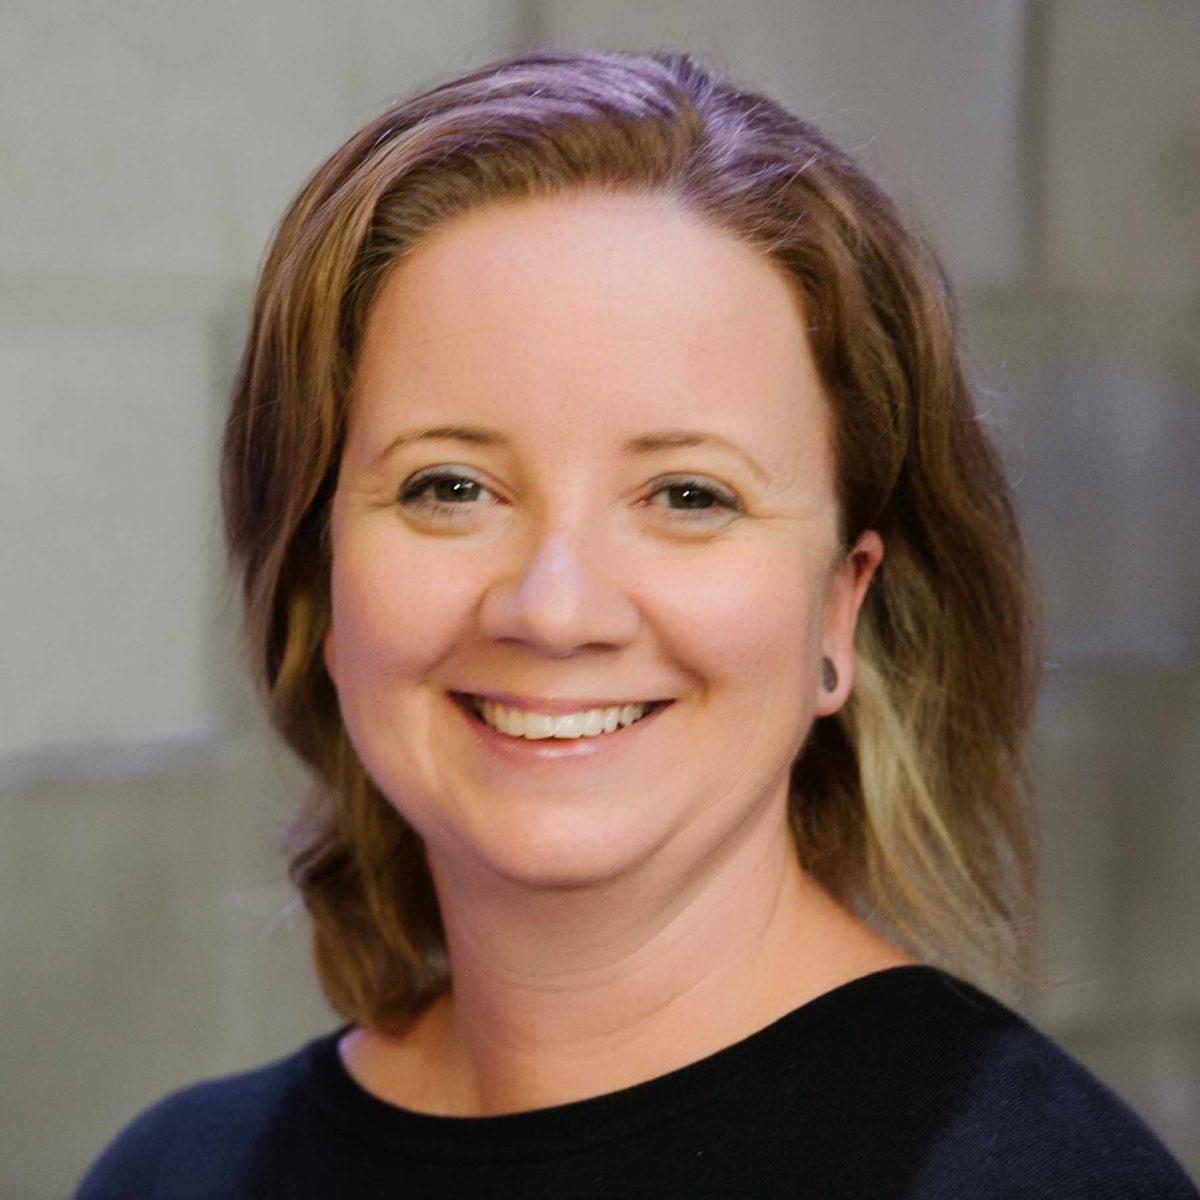 Heidi Aliski